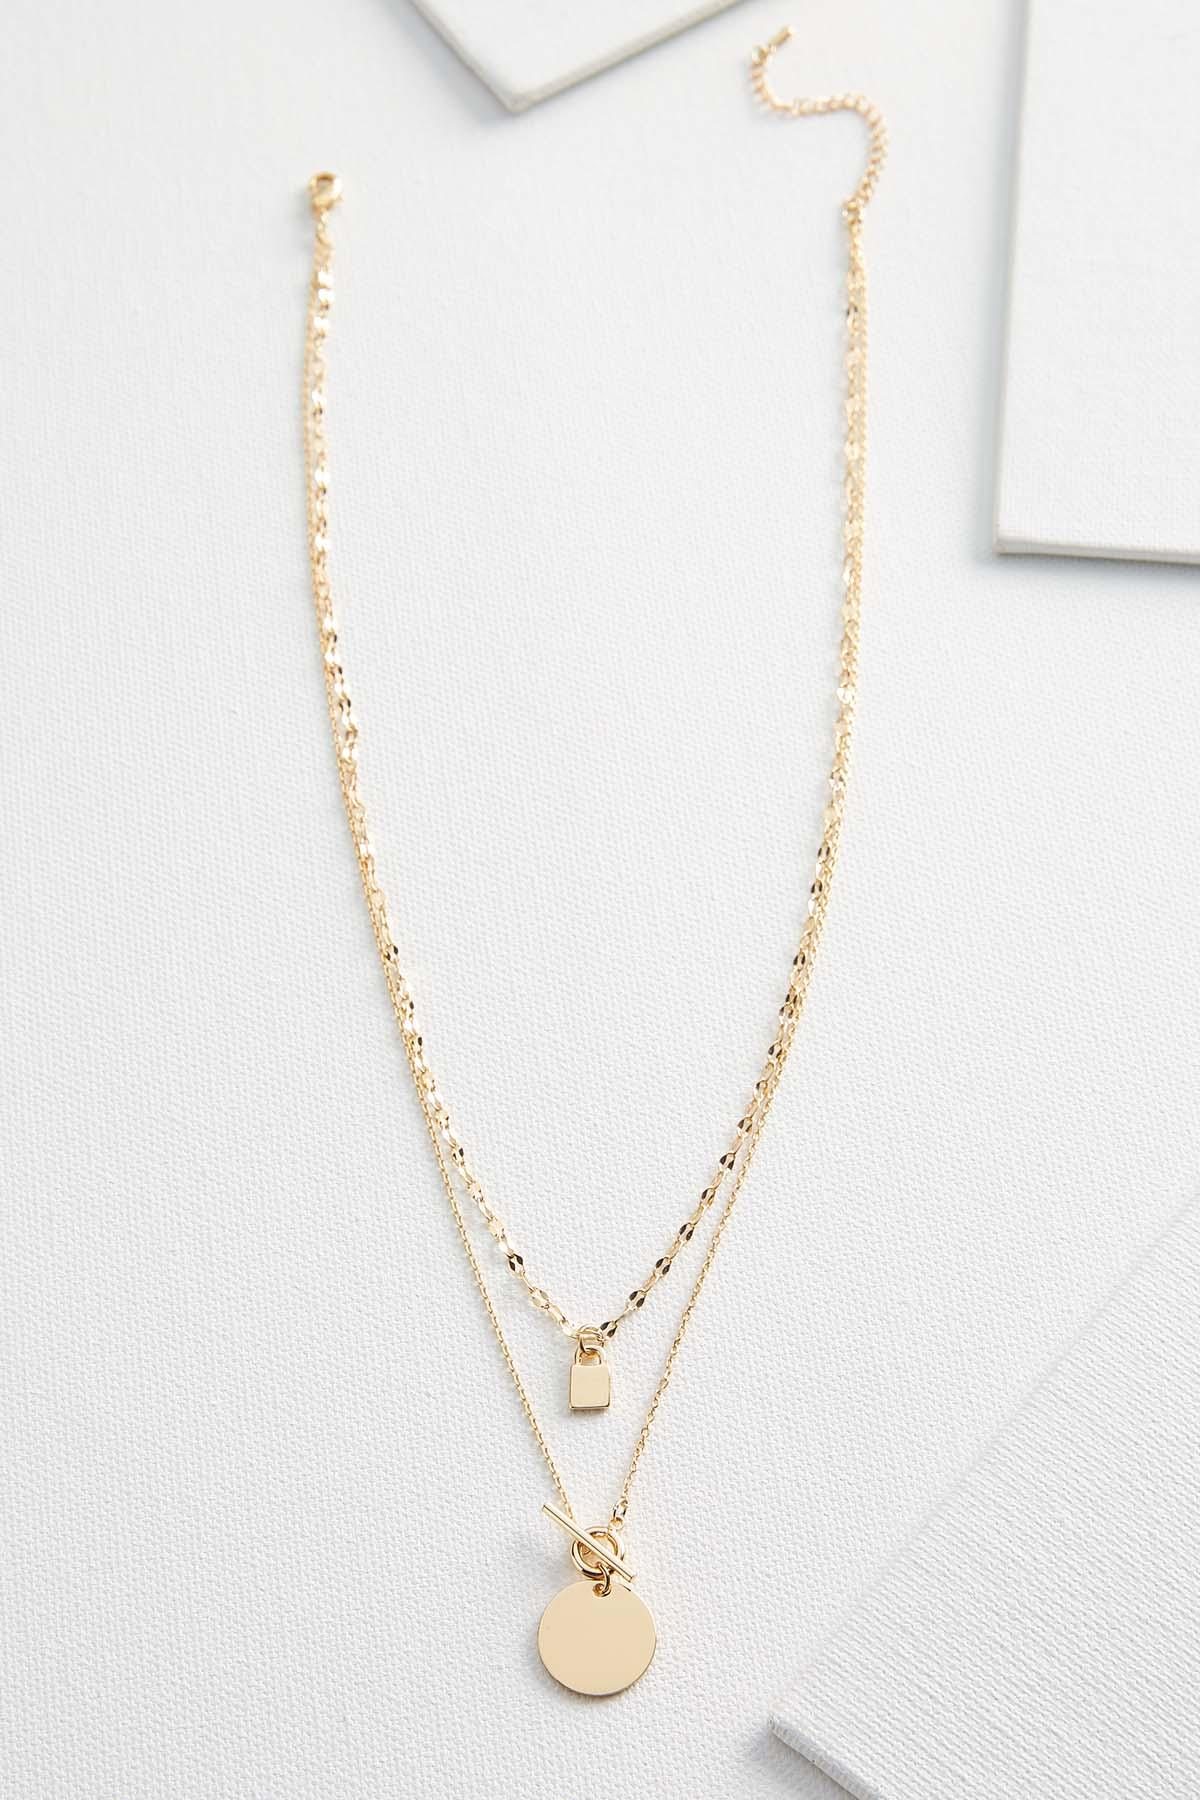 Dainty Lock Pendant Necklace